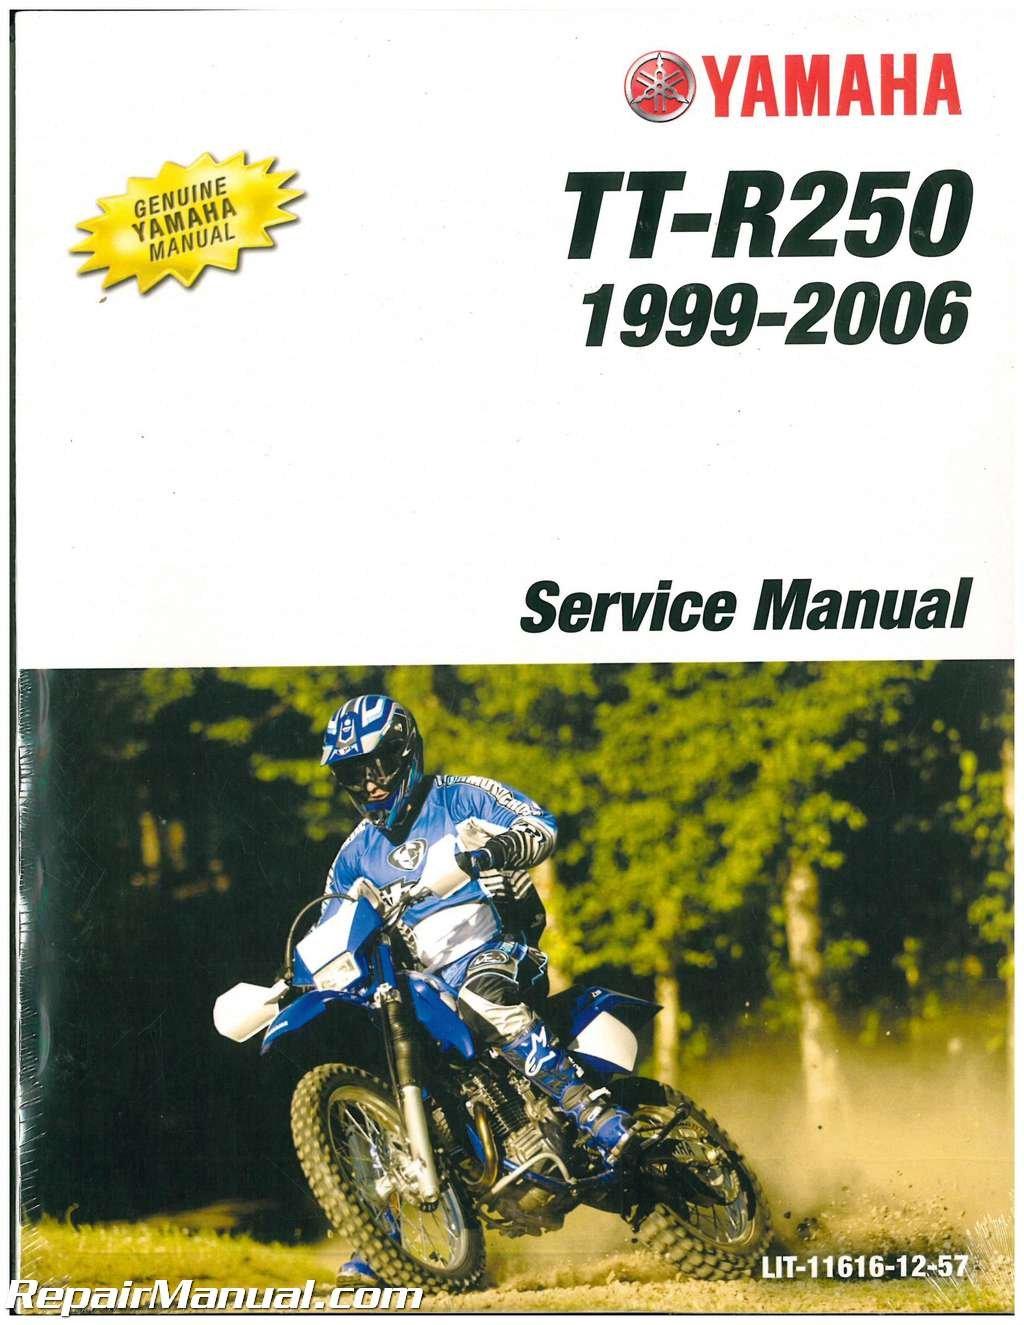 LIT-11616-12-57 1999-2006 Yamaha TTR250 Motorcycle Service Manual:  Manufacturer: Amazon.com: Books